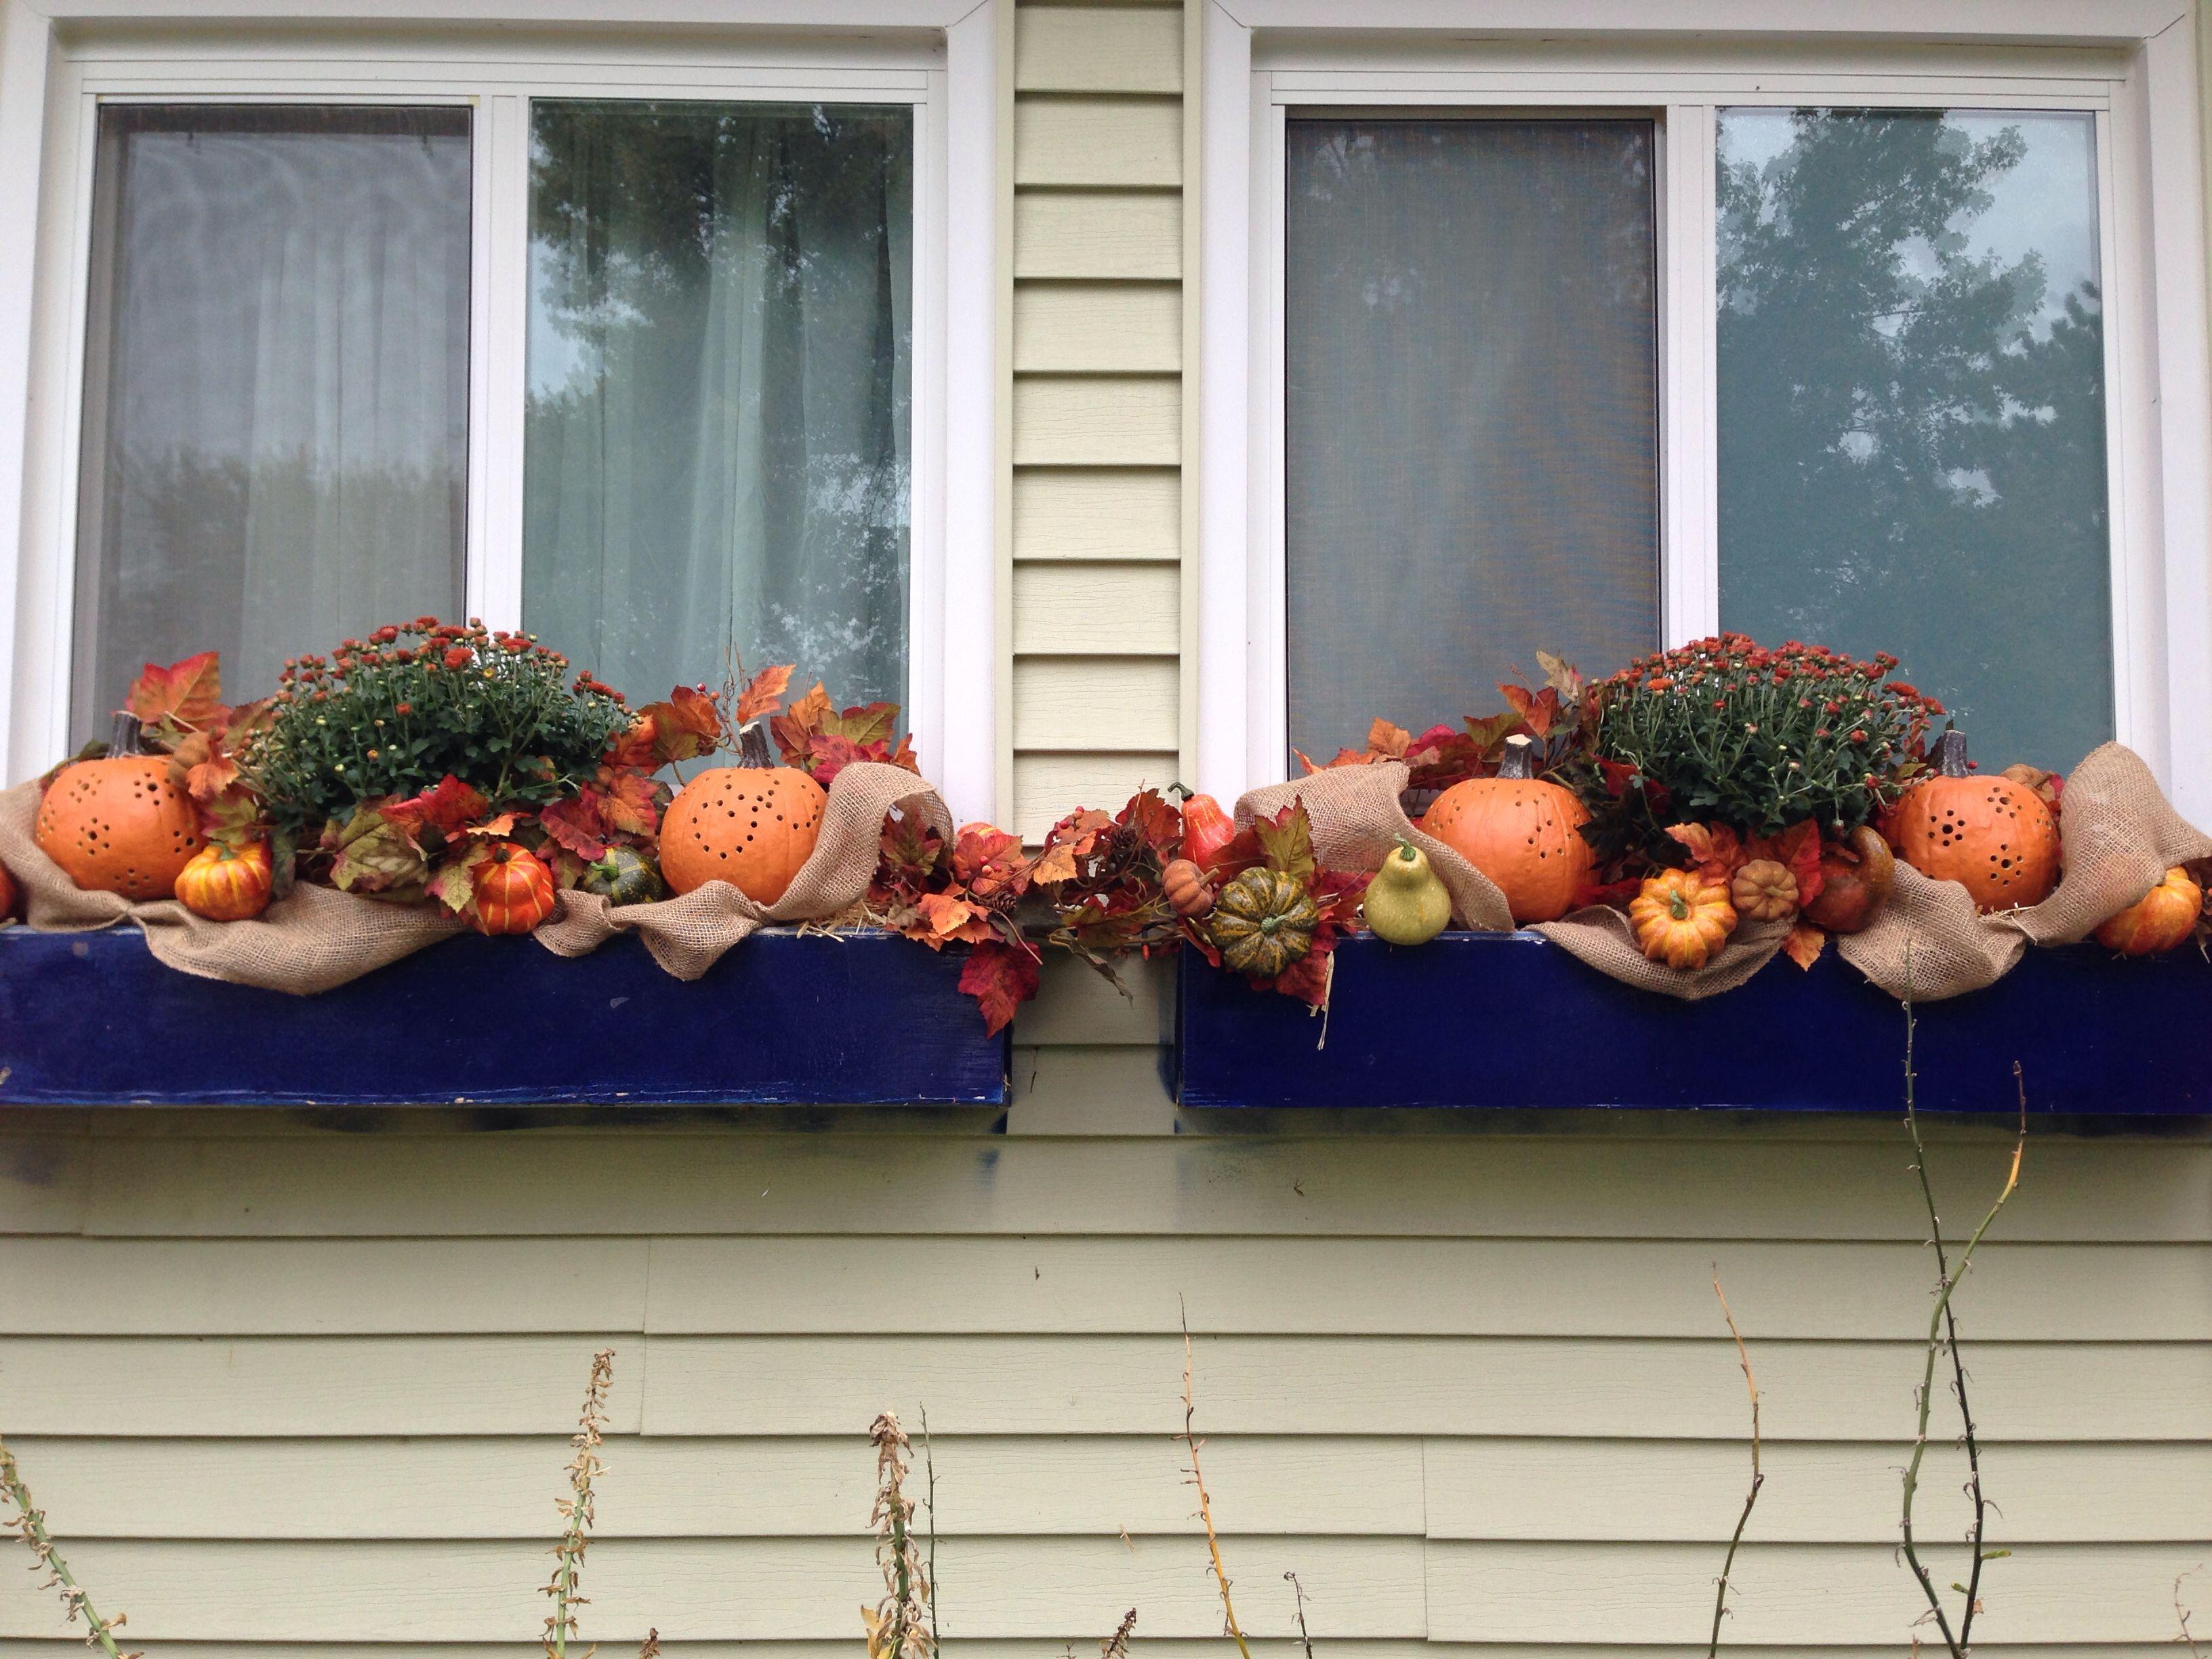 Fall window boxes festive decor wreaths etc pinterest - Window decorations for fall ...